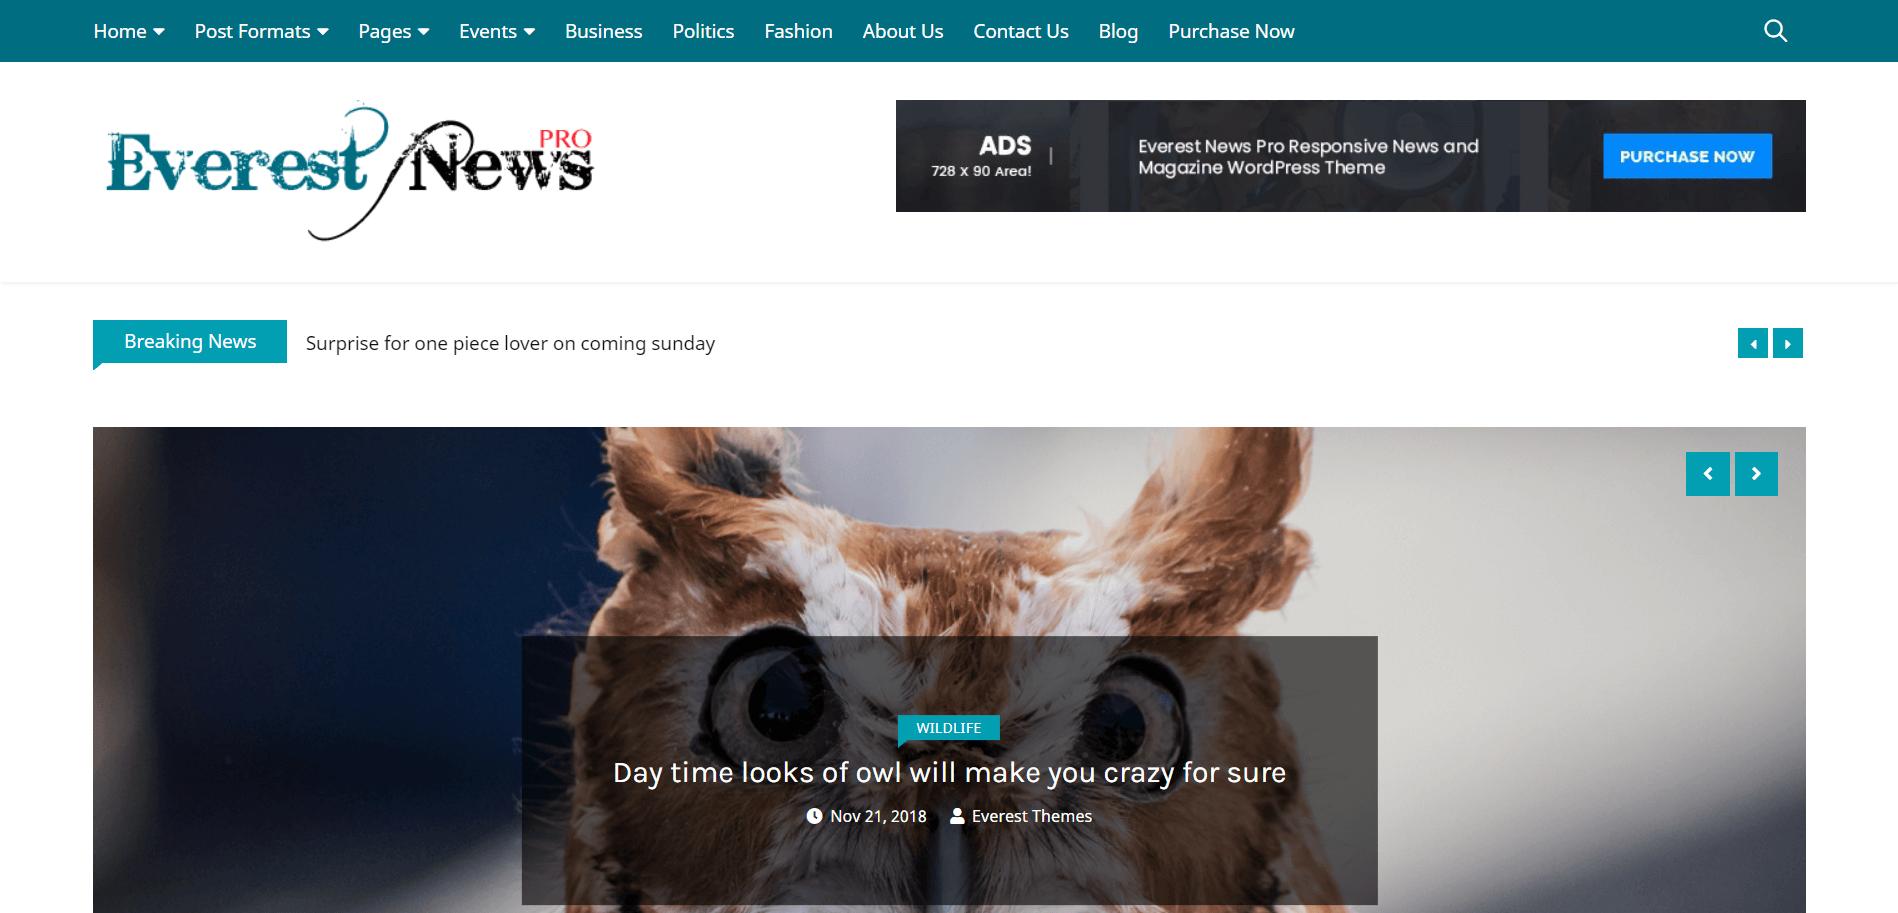 Everest-News-Pro-best-premium-SEO-friendly-WordPress-themes-EverestThemes